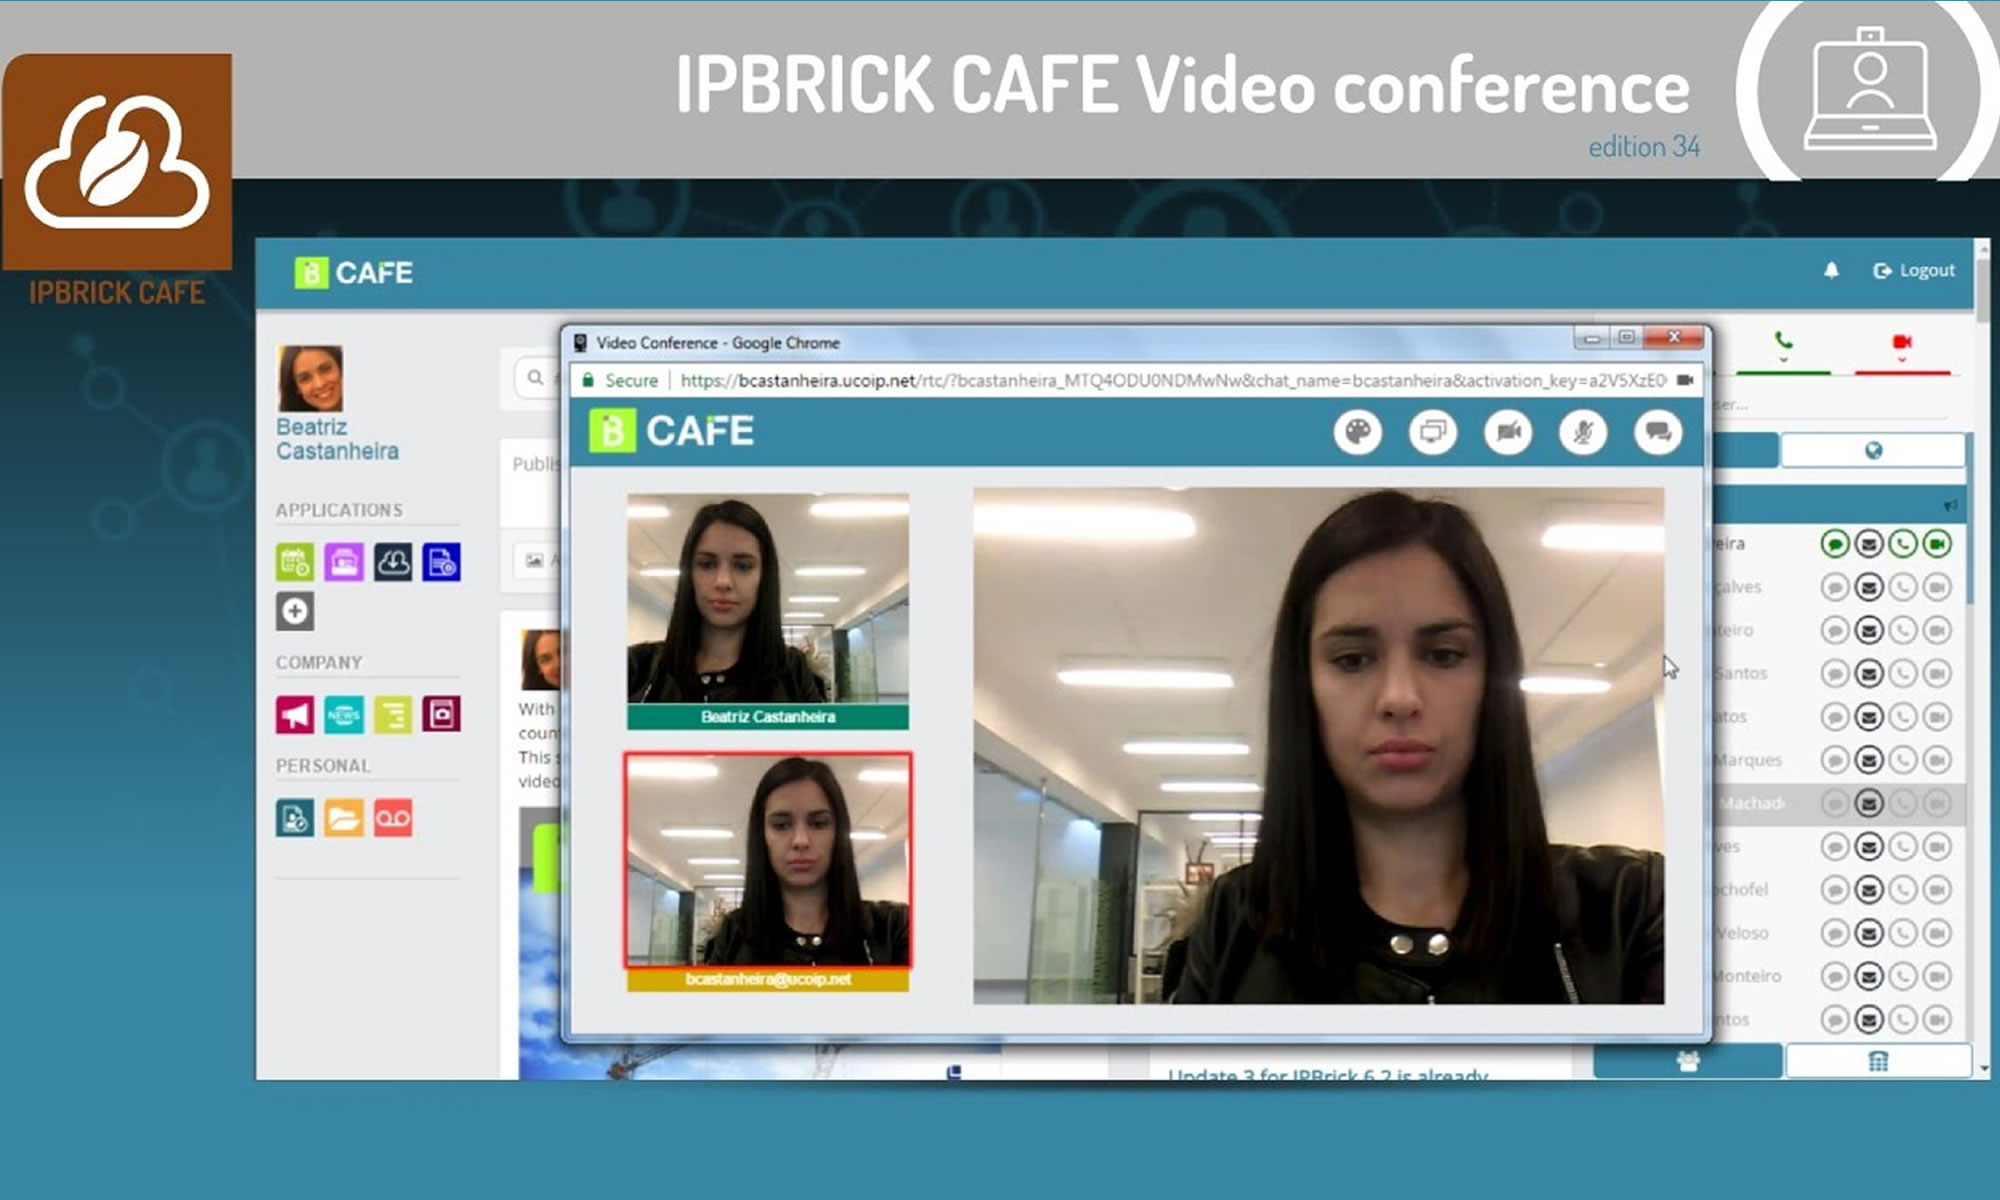 ipbrick cafe enterpise social network